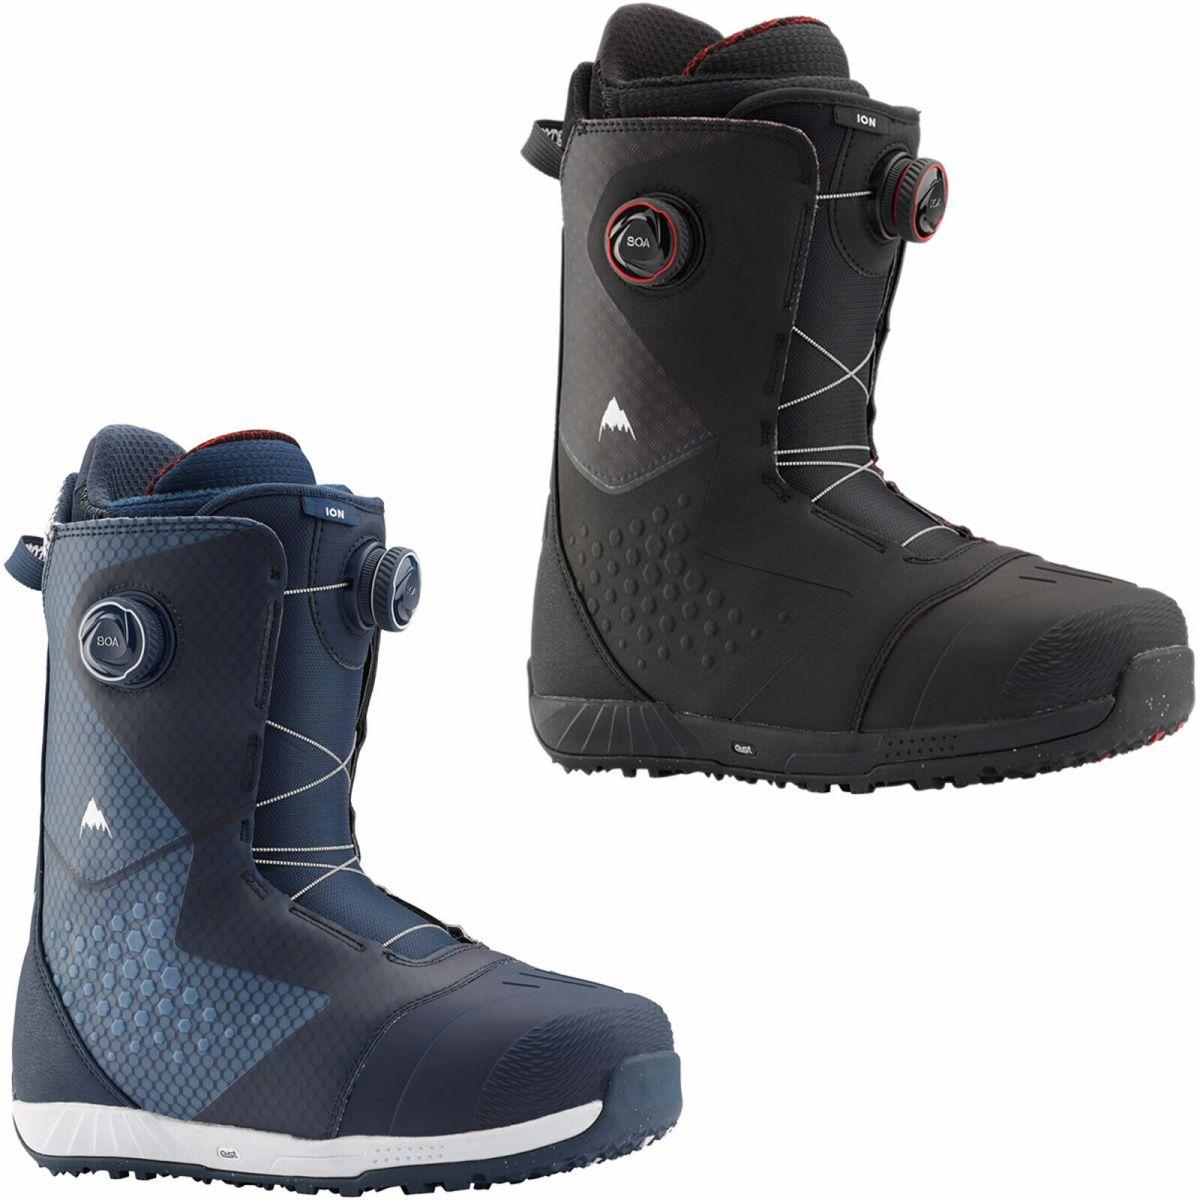 Burton Ion Boa Herren Snowboardschuhe Softboots Snowboard Boots 2020 NEU